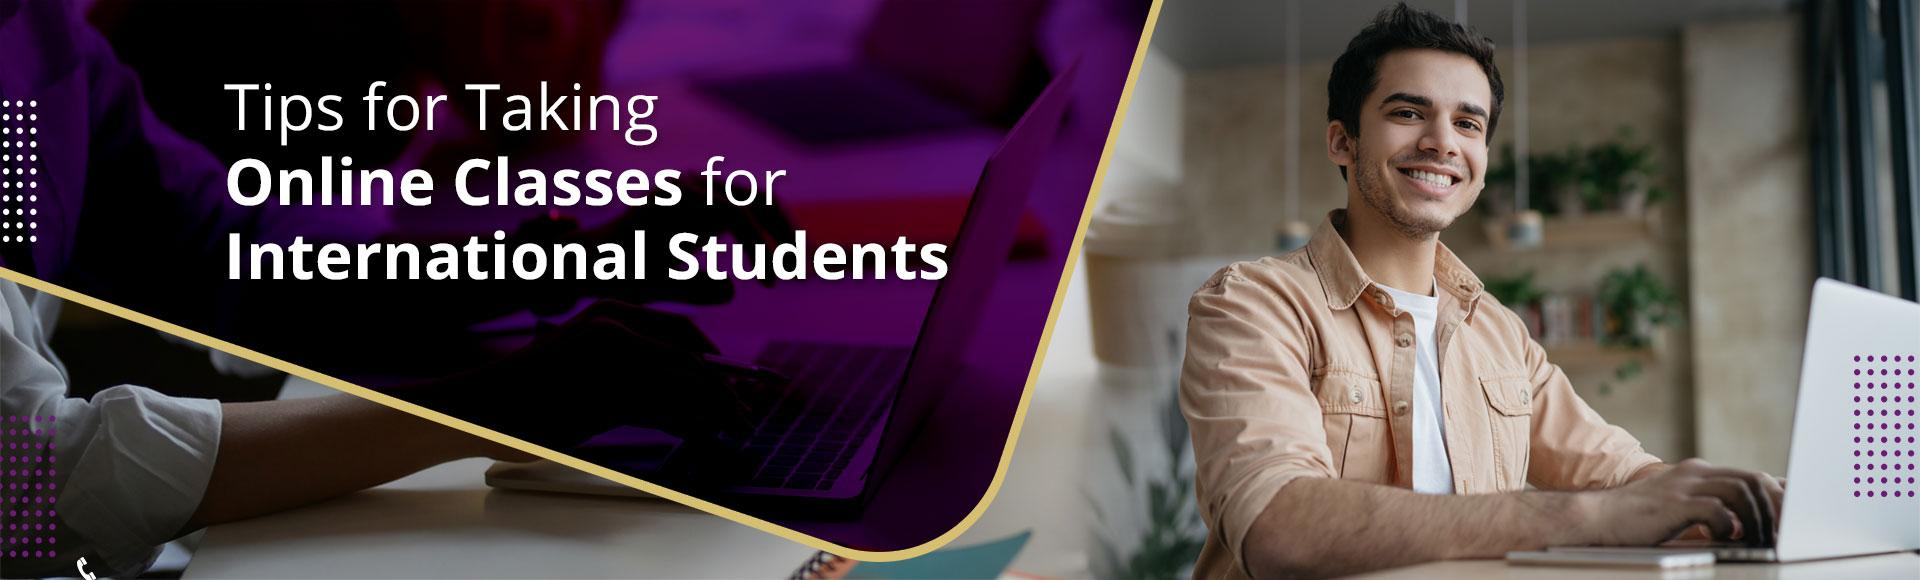 Tips for Taking Online Classes for International Students